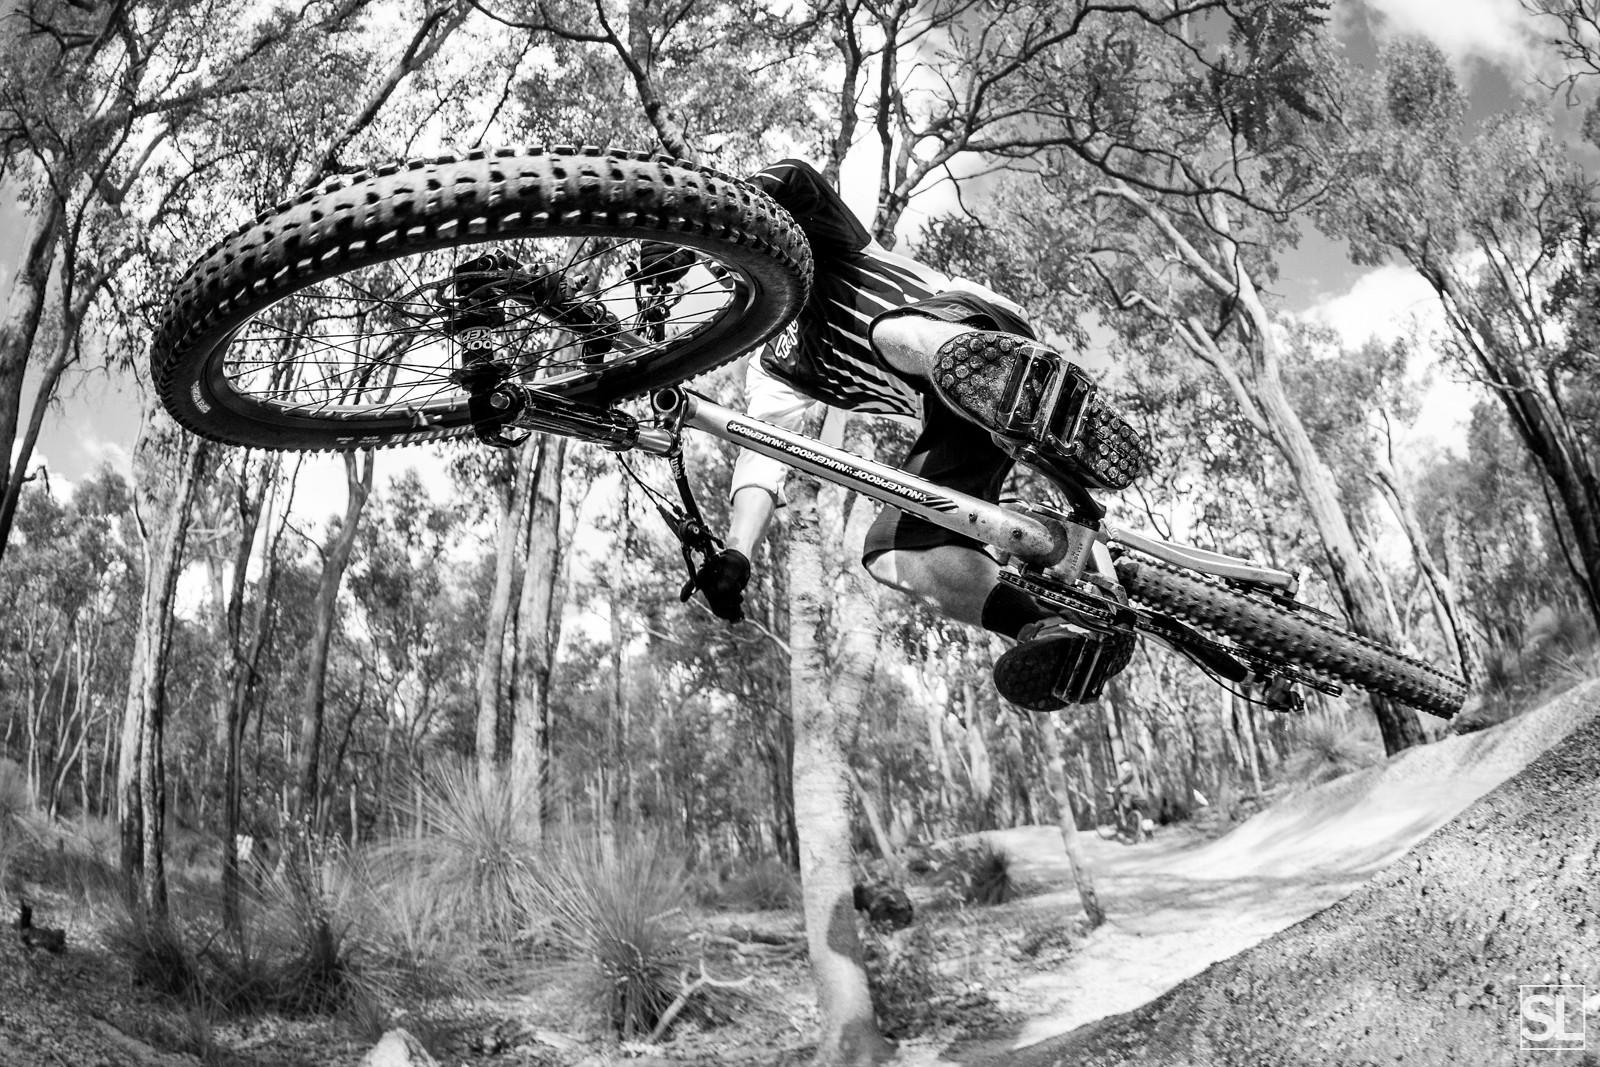 xc bike scrubs - Chamakazi - Mountain Biking Pictures - Vital MTB